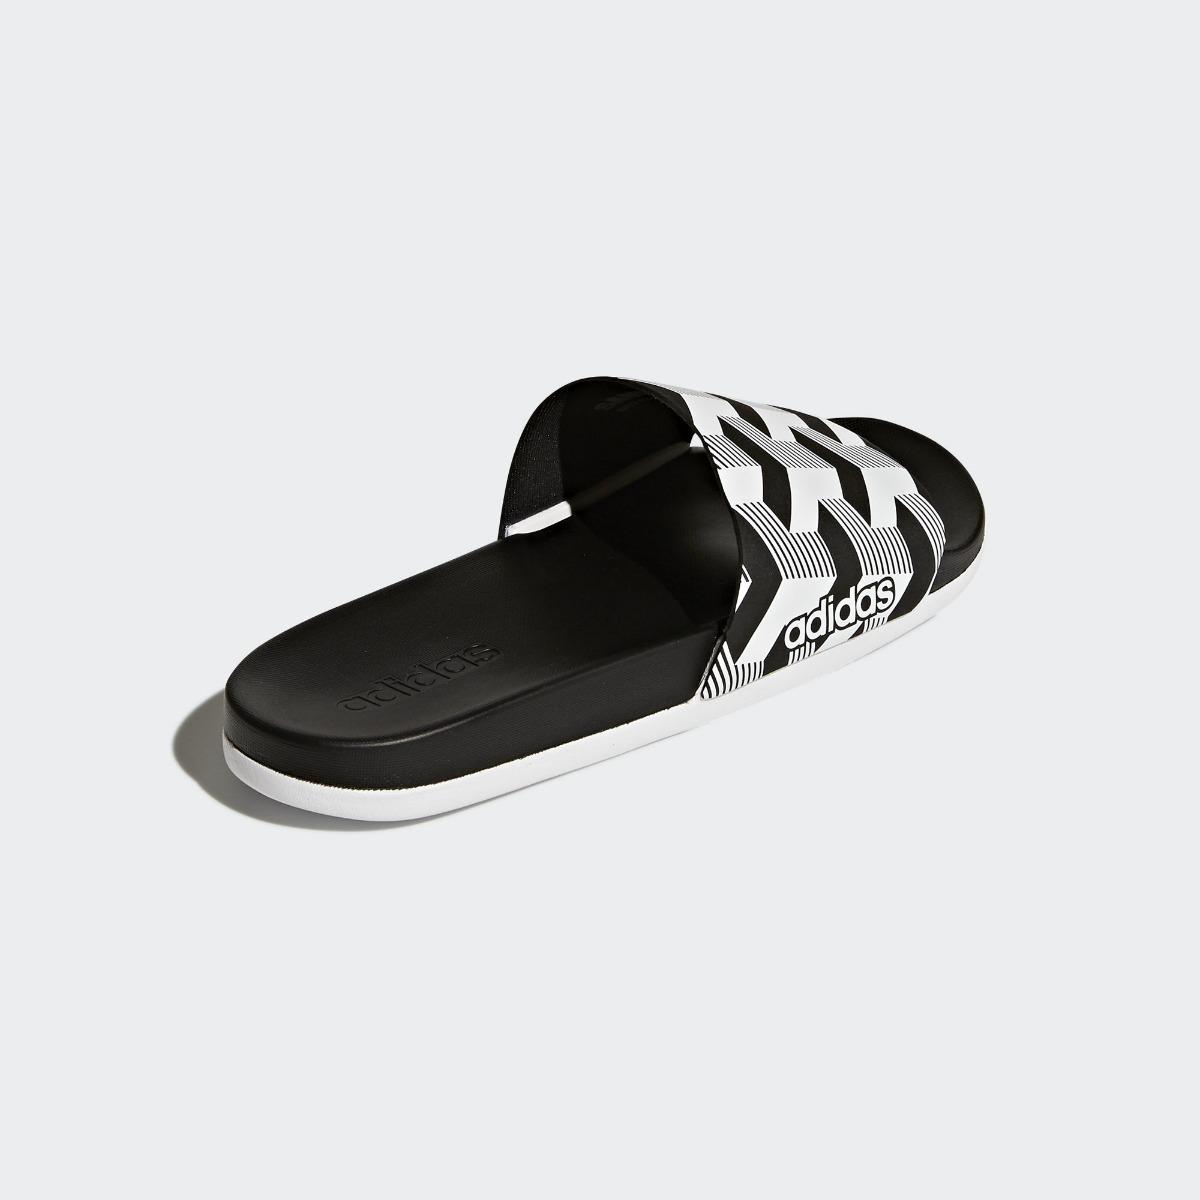 eb693eda0cf3f sandalias adidas adilette cloudfoam ultra slides originales. Cargando zoom.